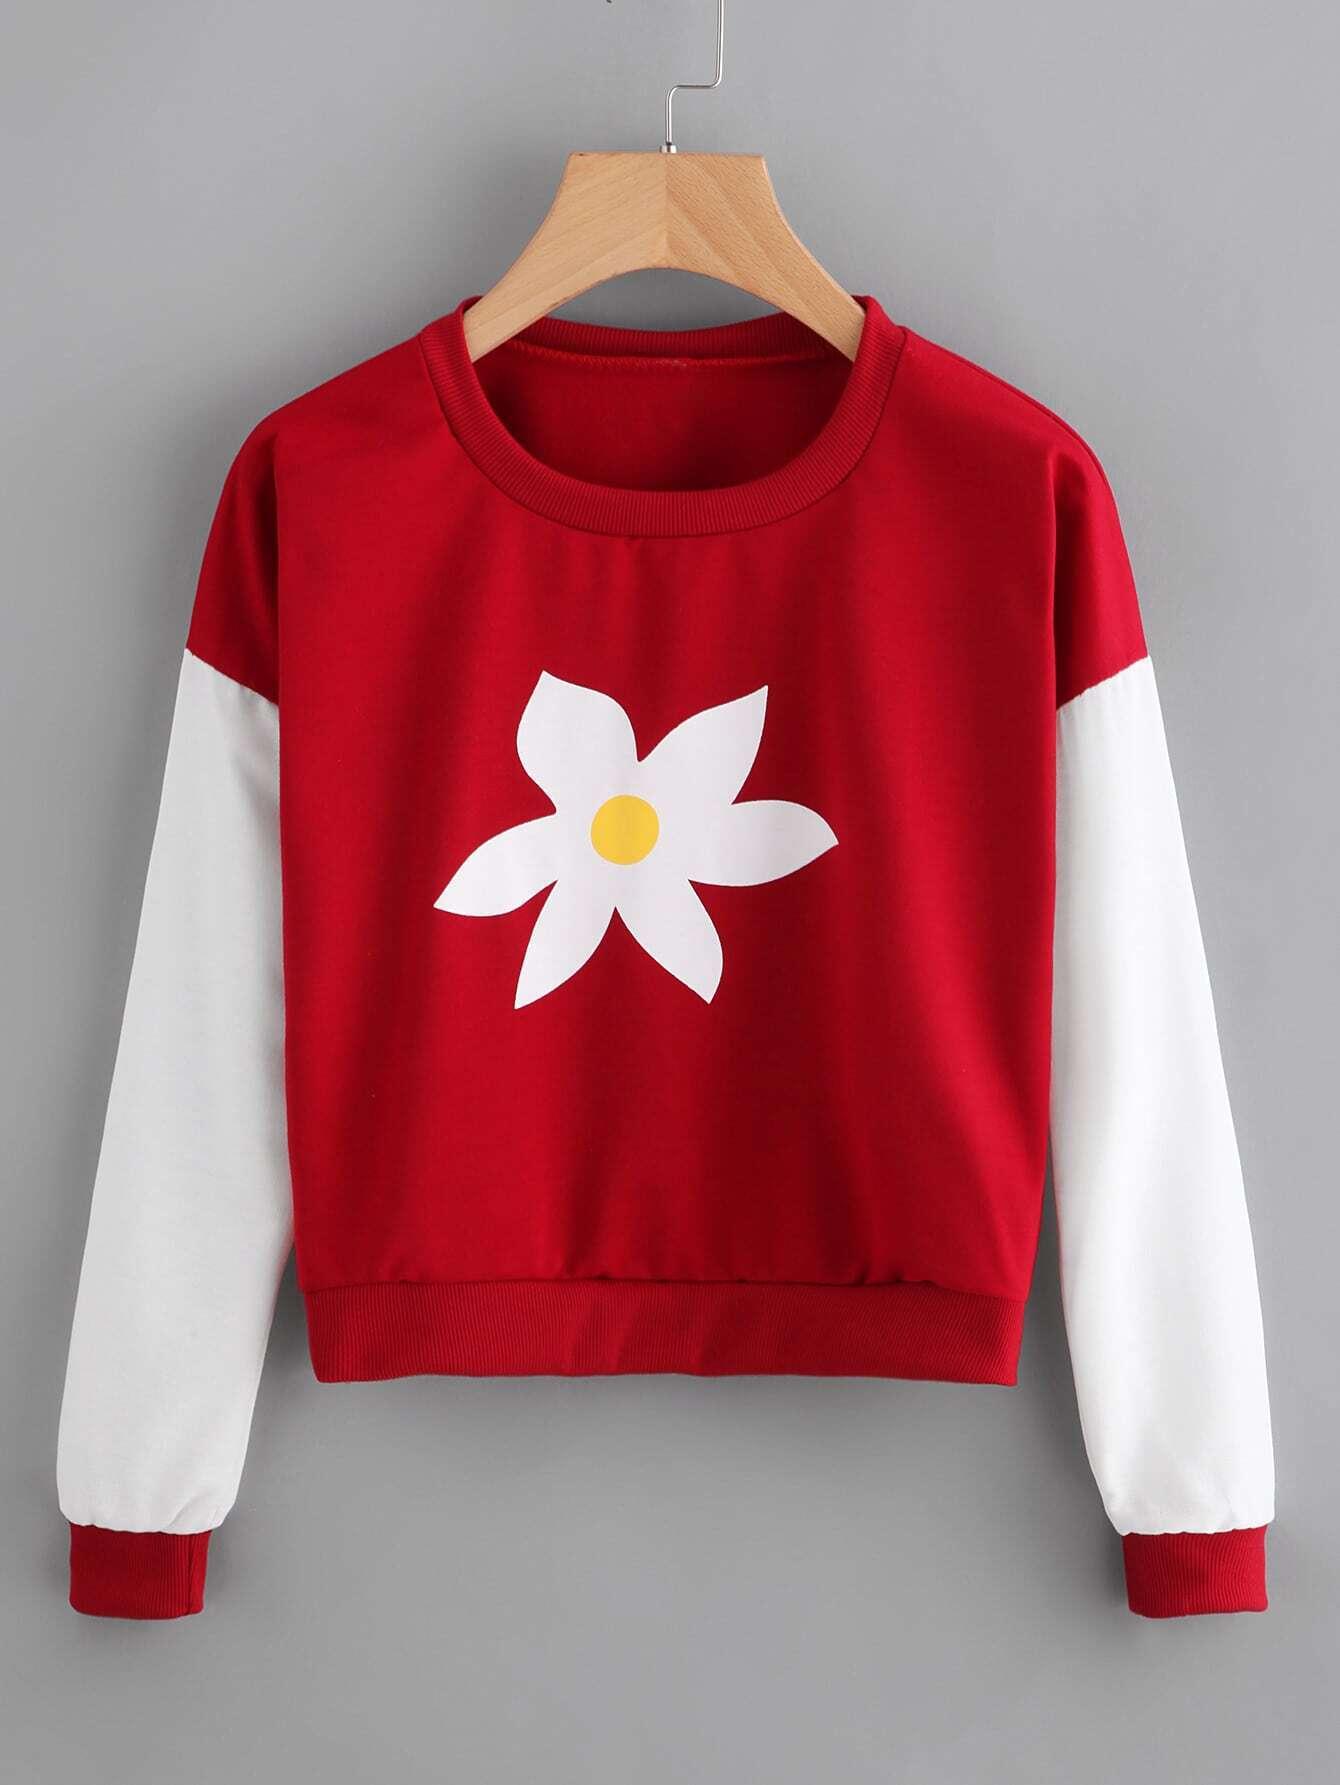 Contrast Sleeve Graphic Print Sweatshirt